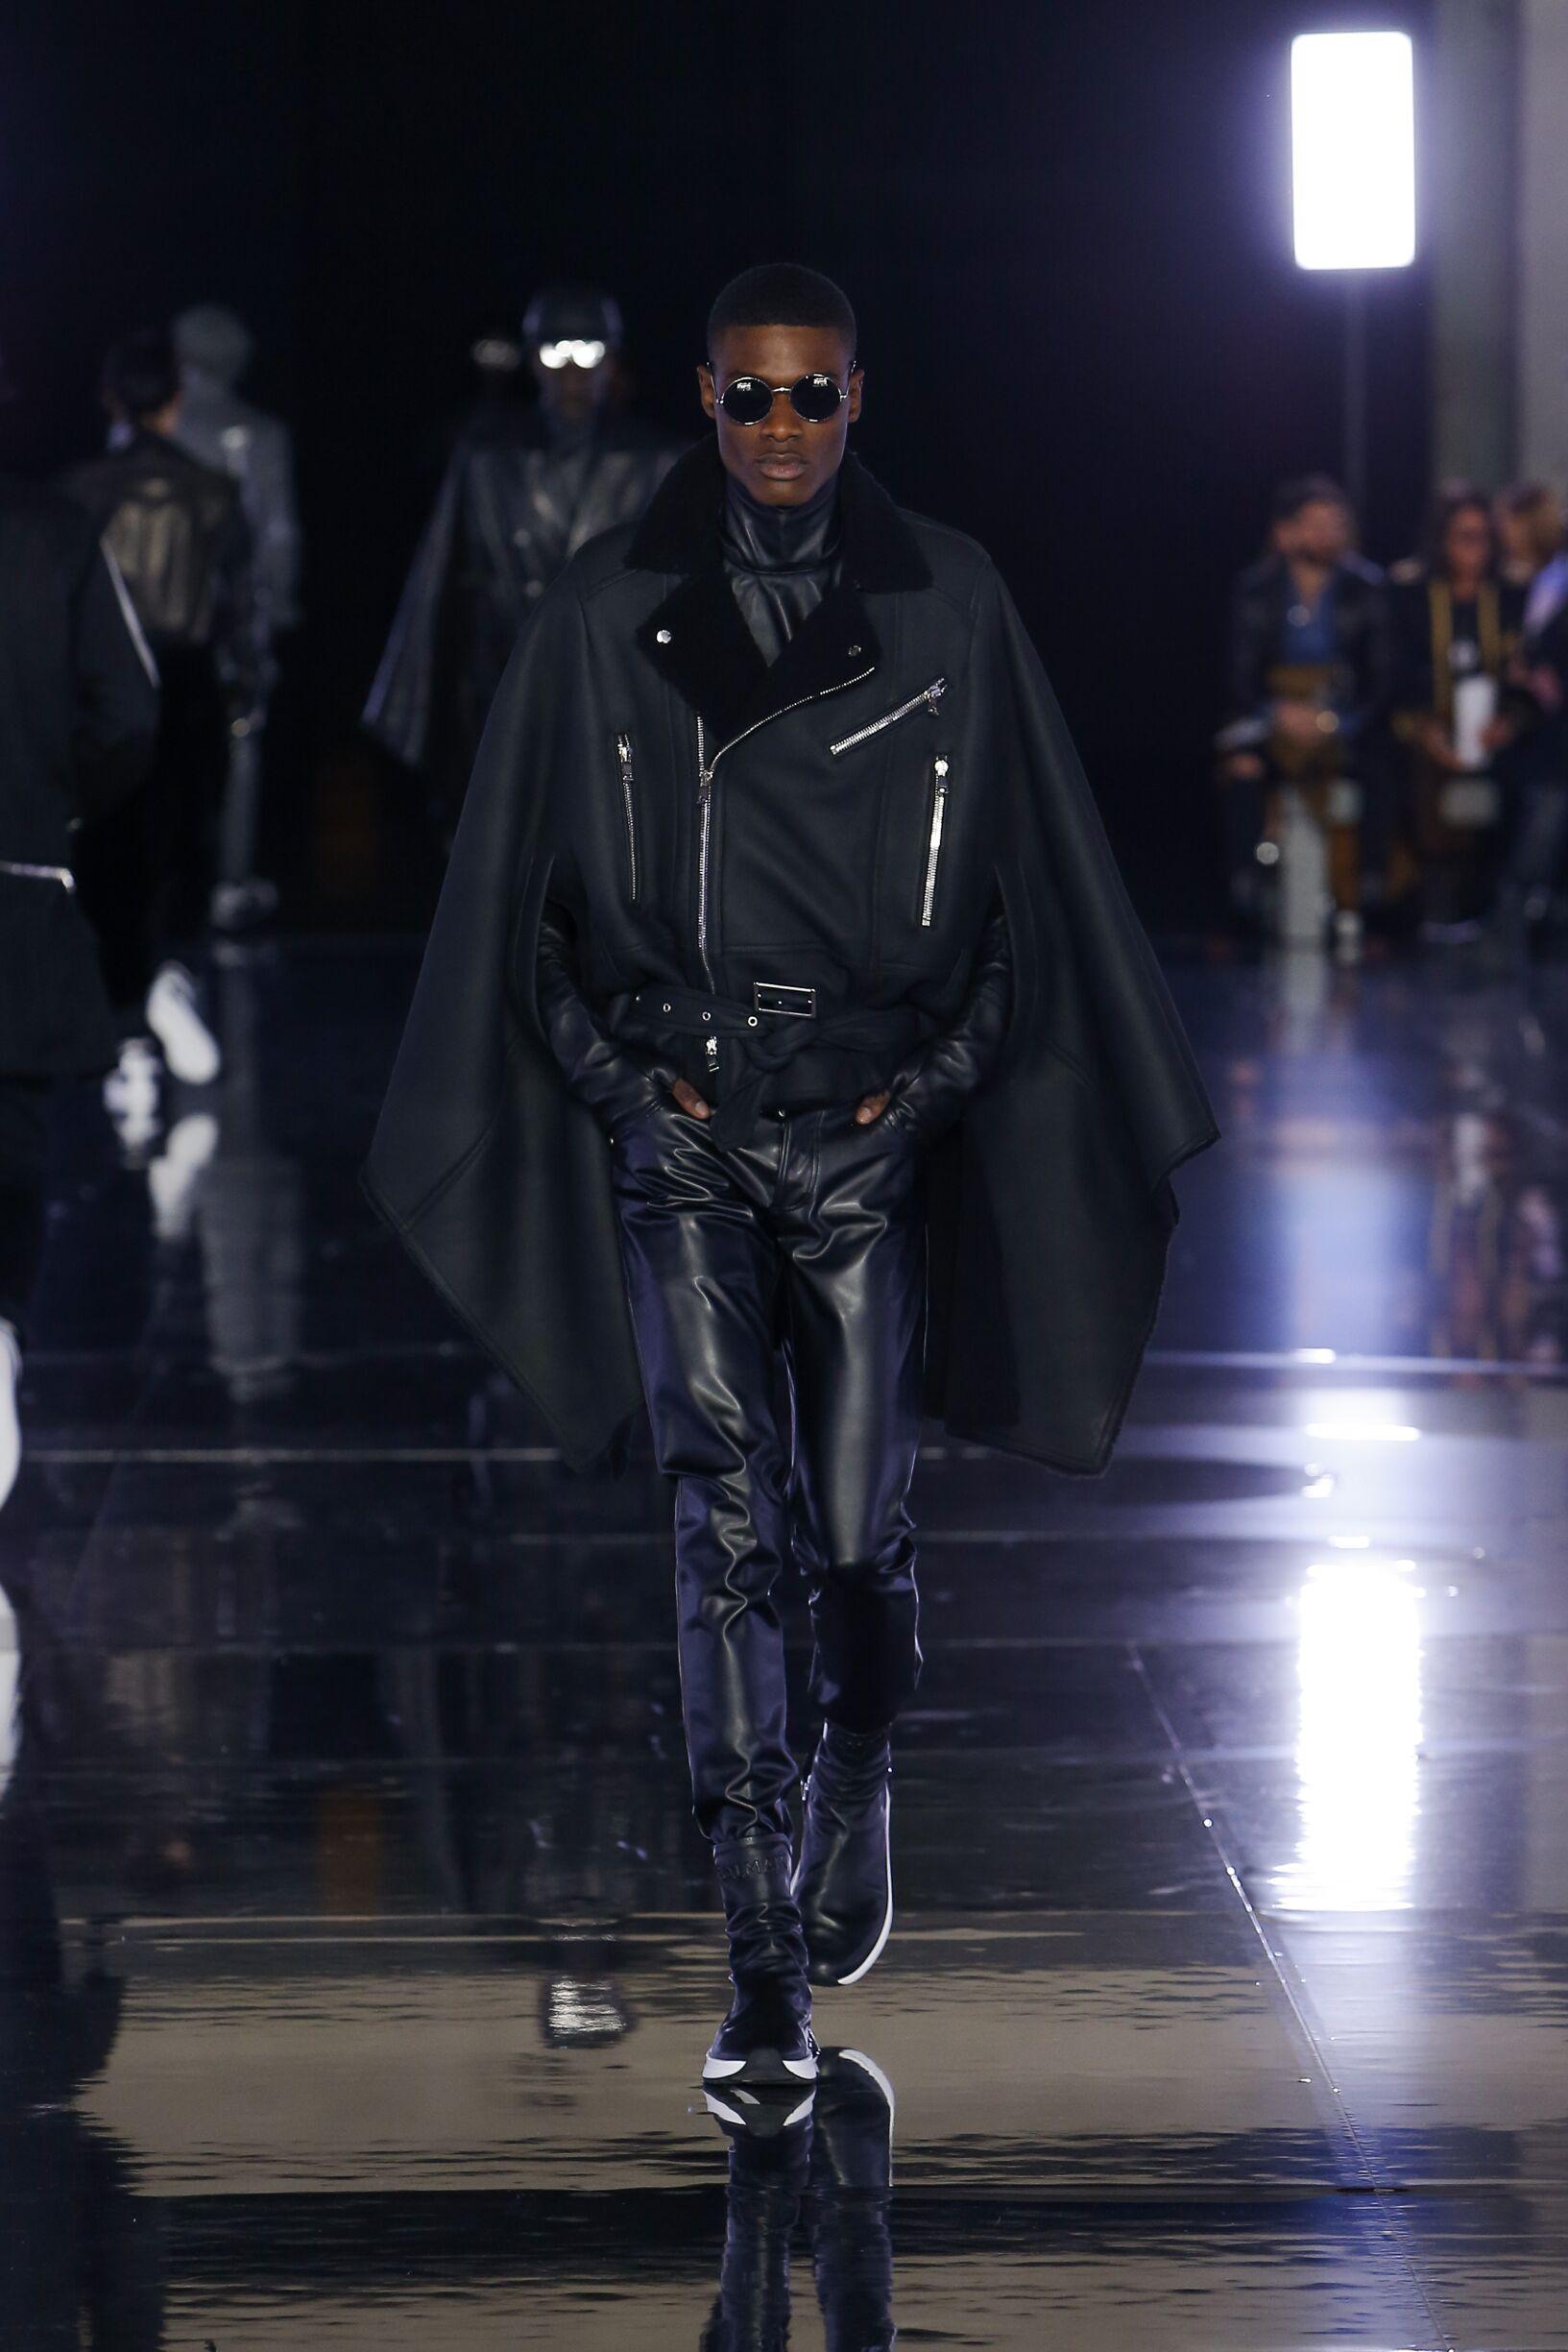 Model Fashion Week 2019-20 Catwalk Balmain